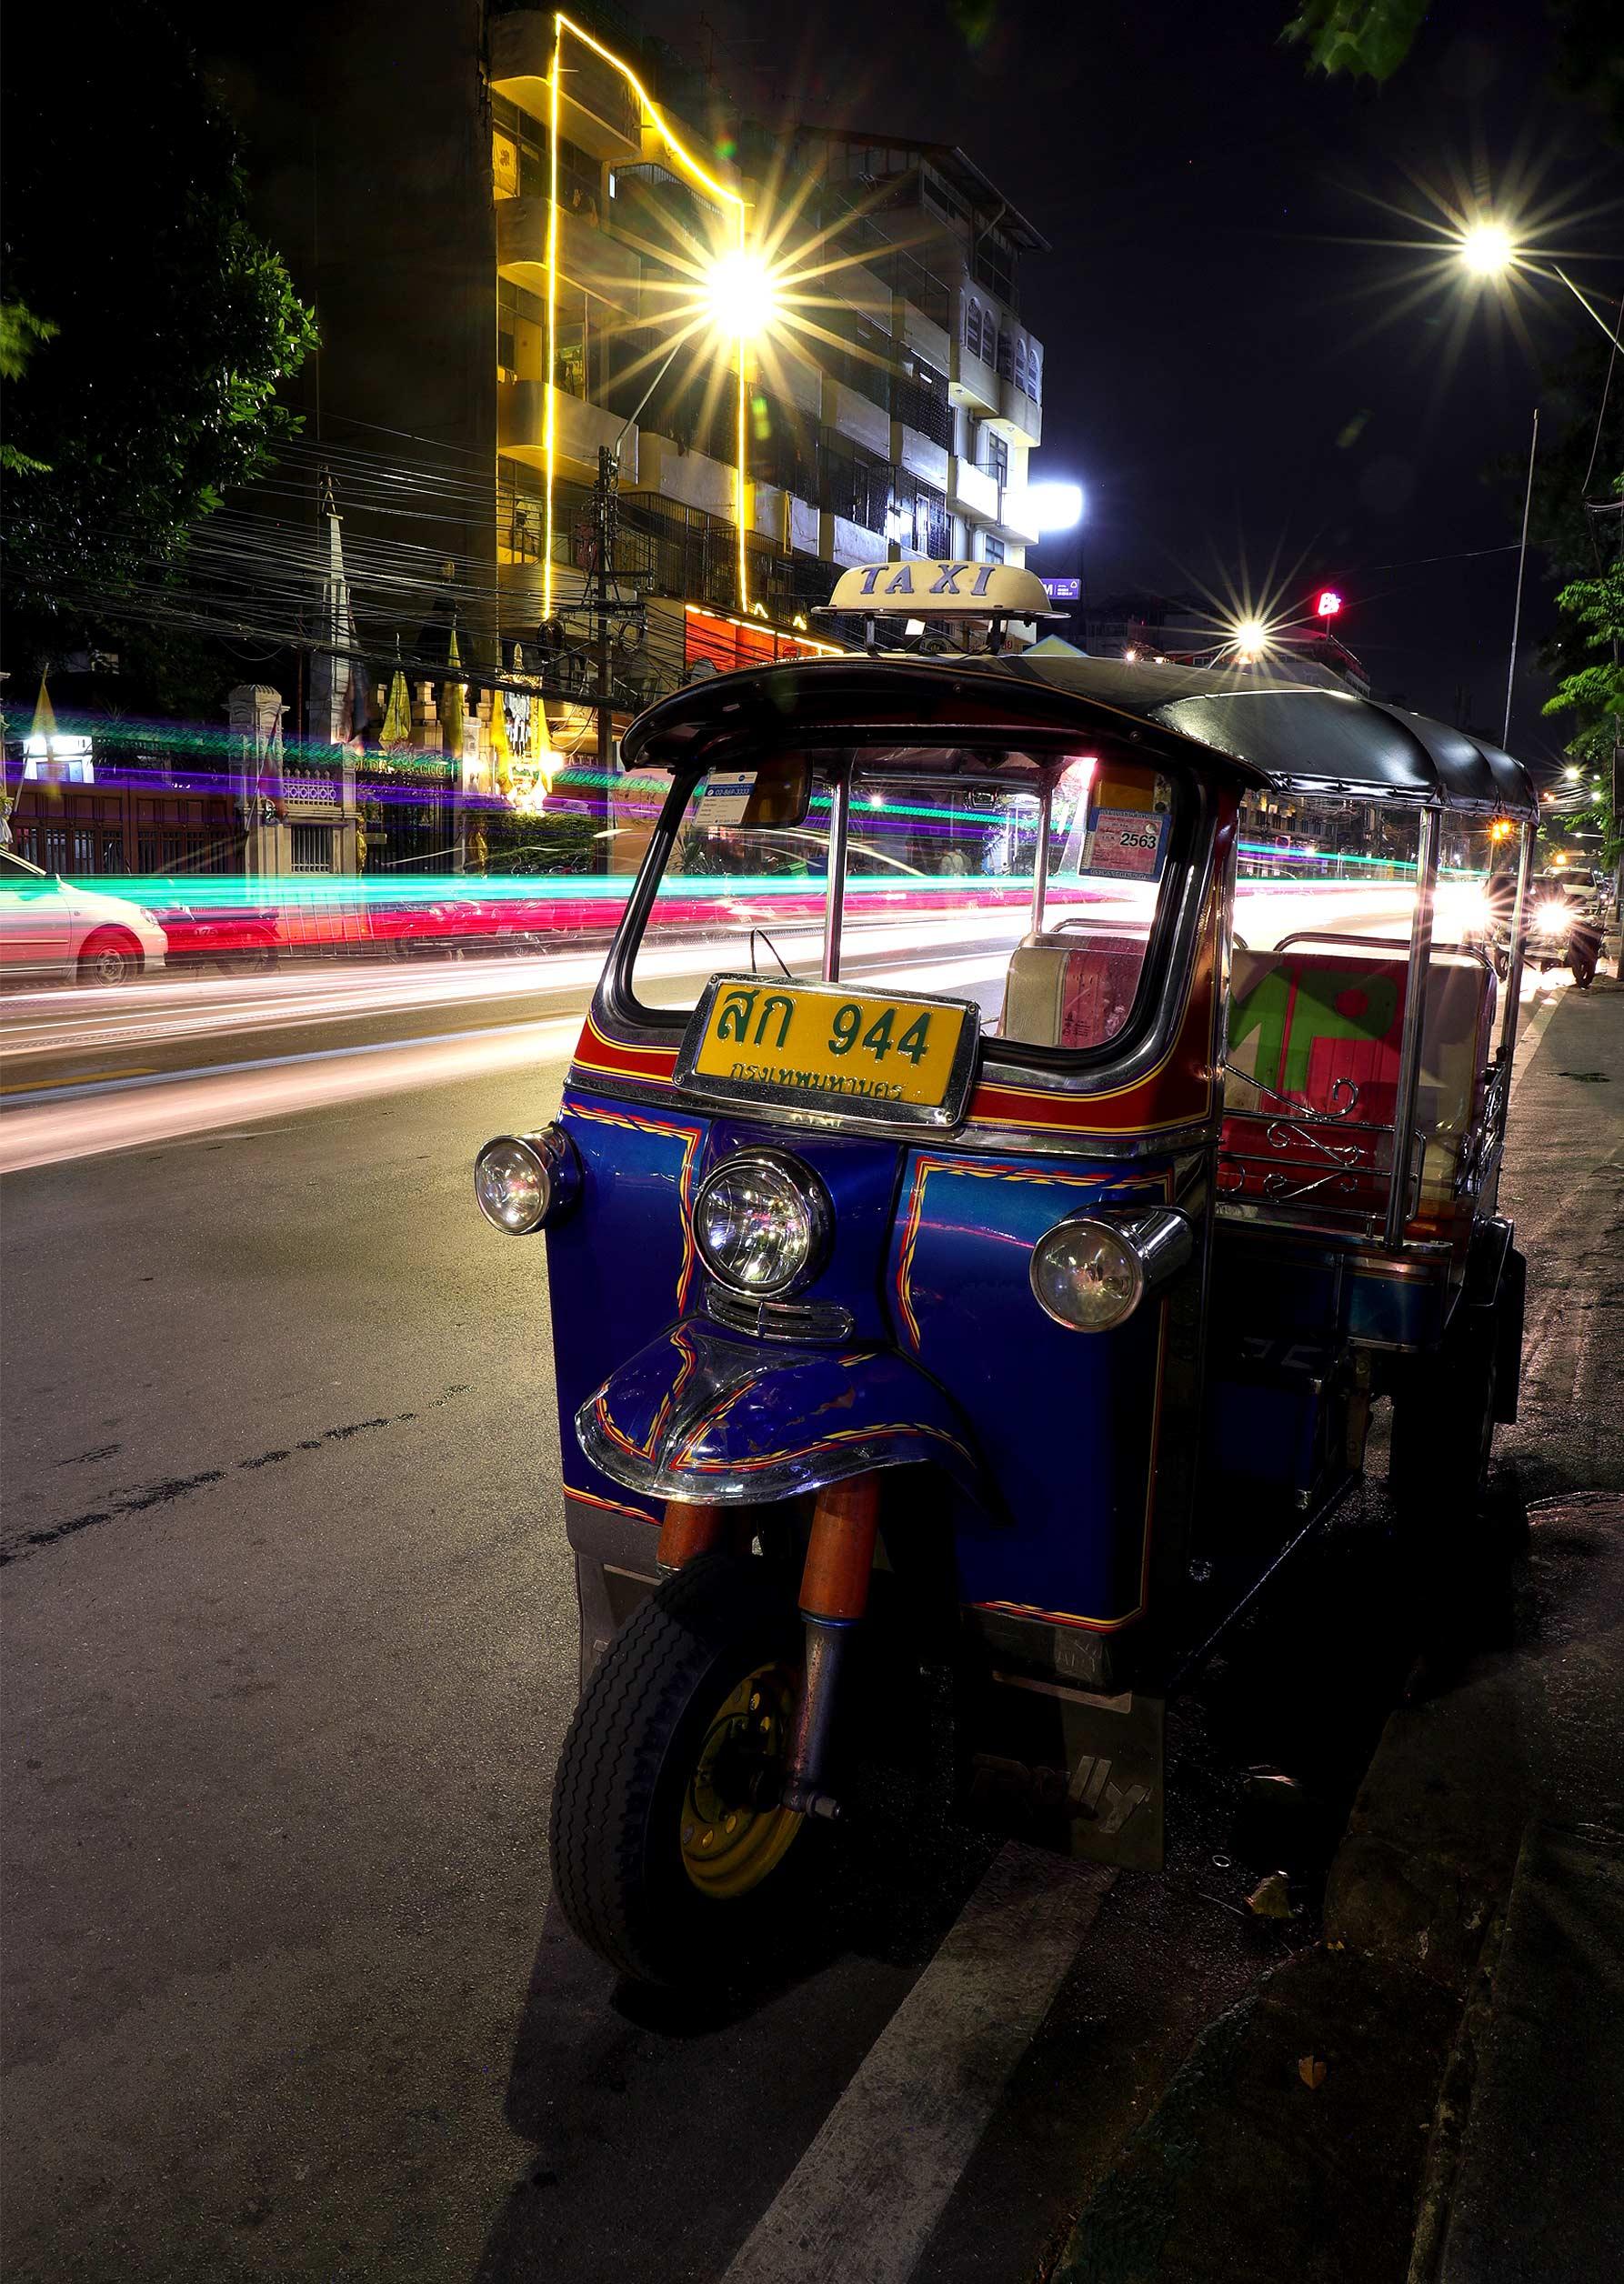 Long exposure night time photograph of a tuk tuk in Bangkok.